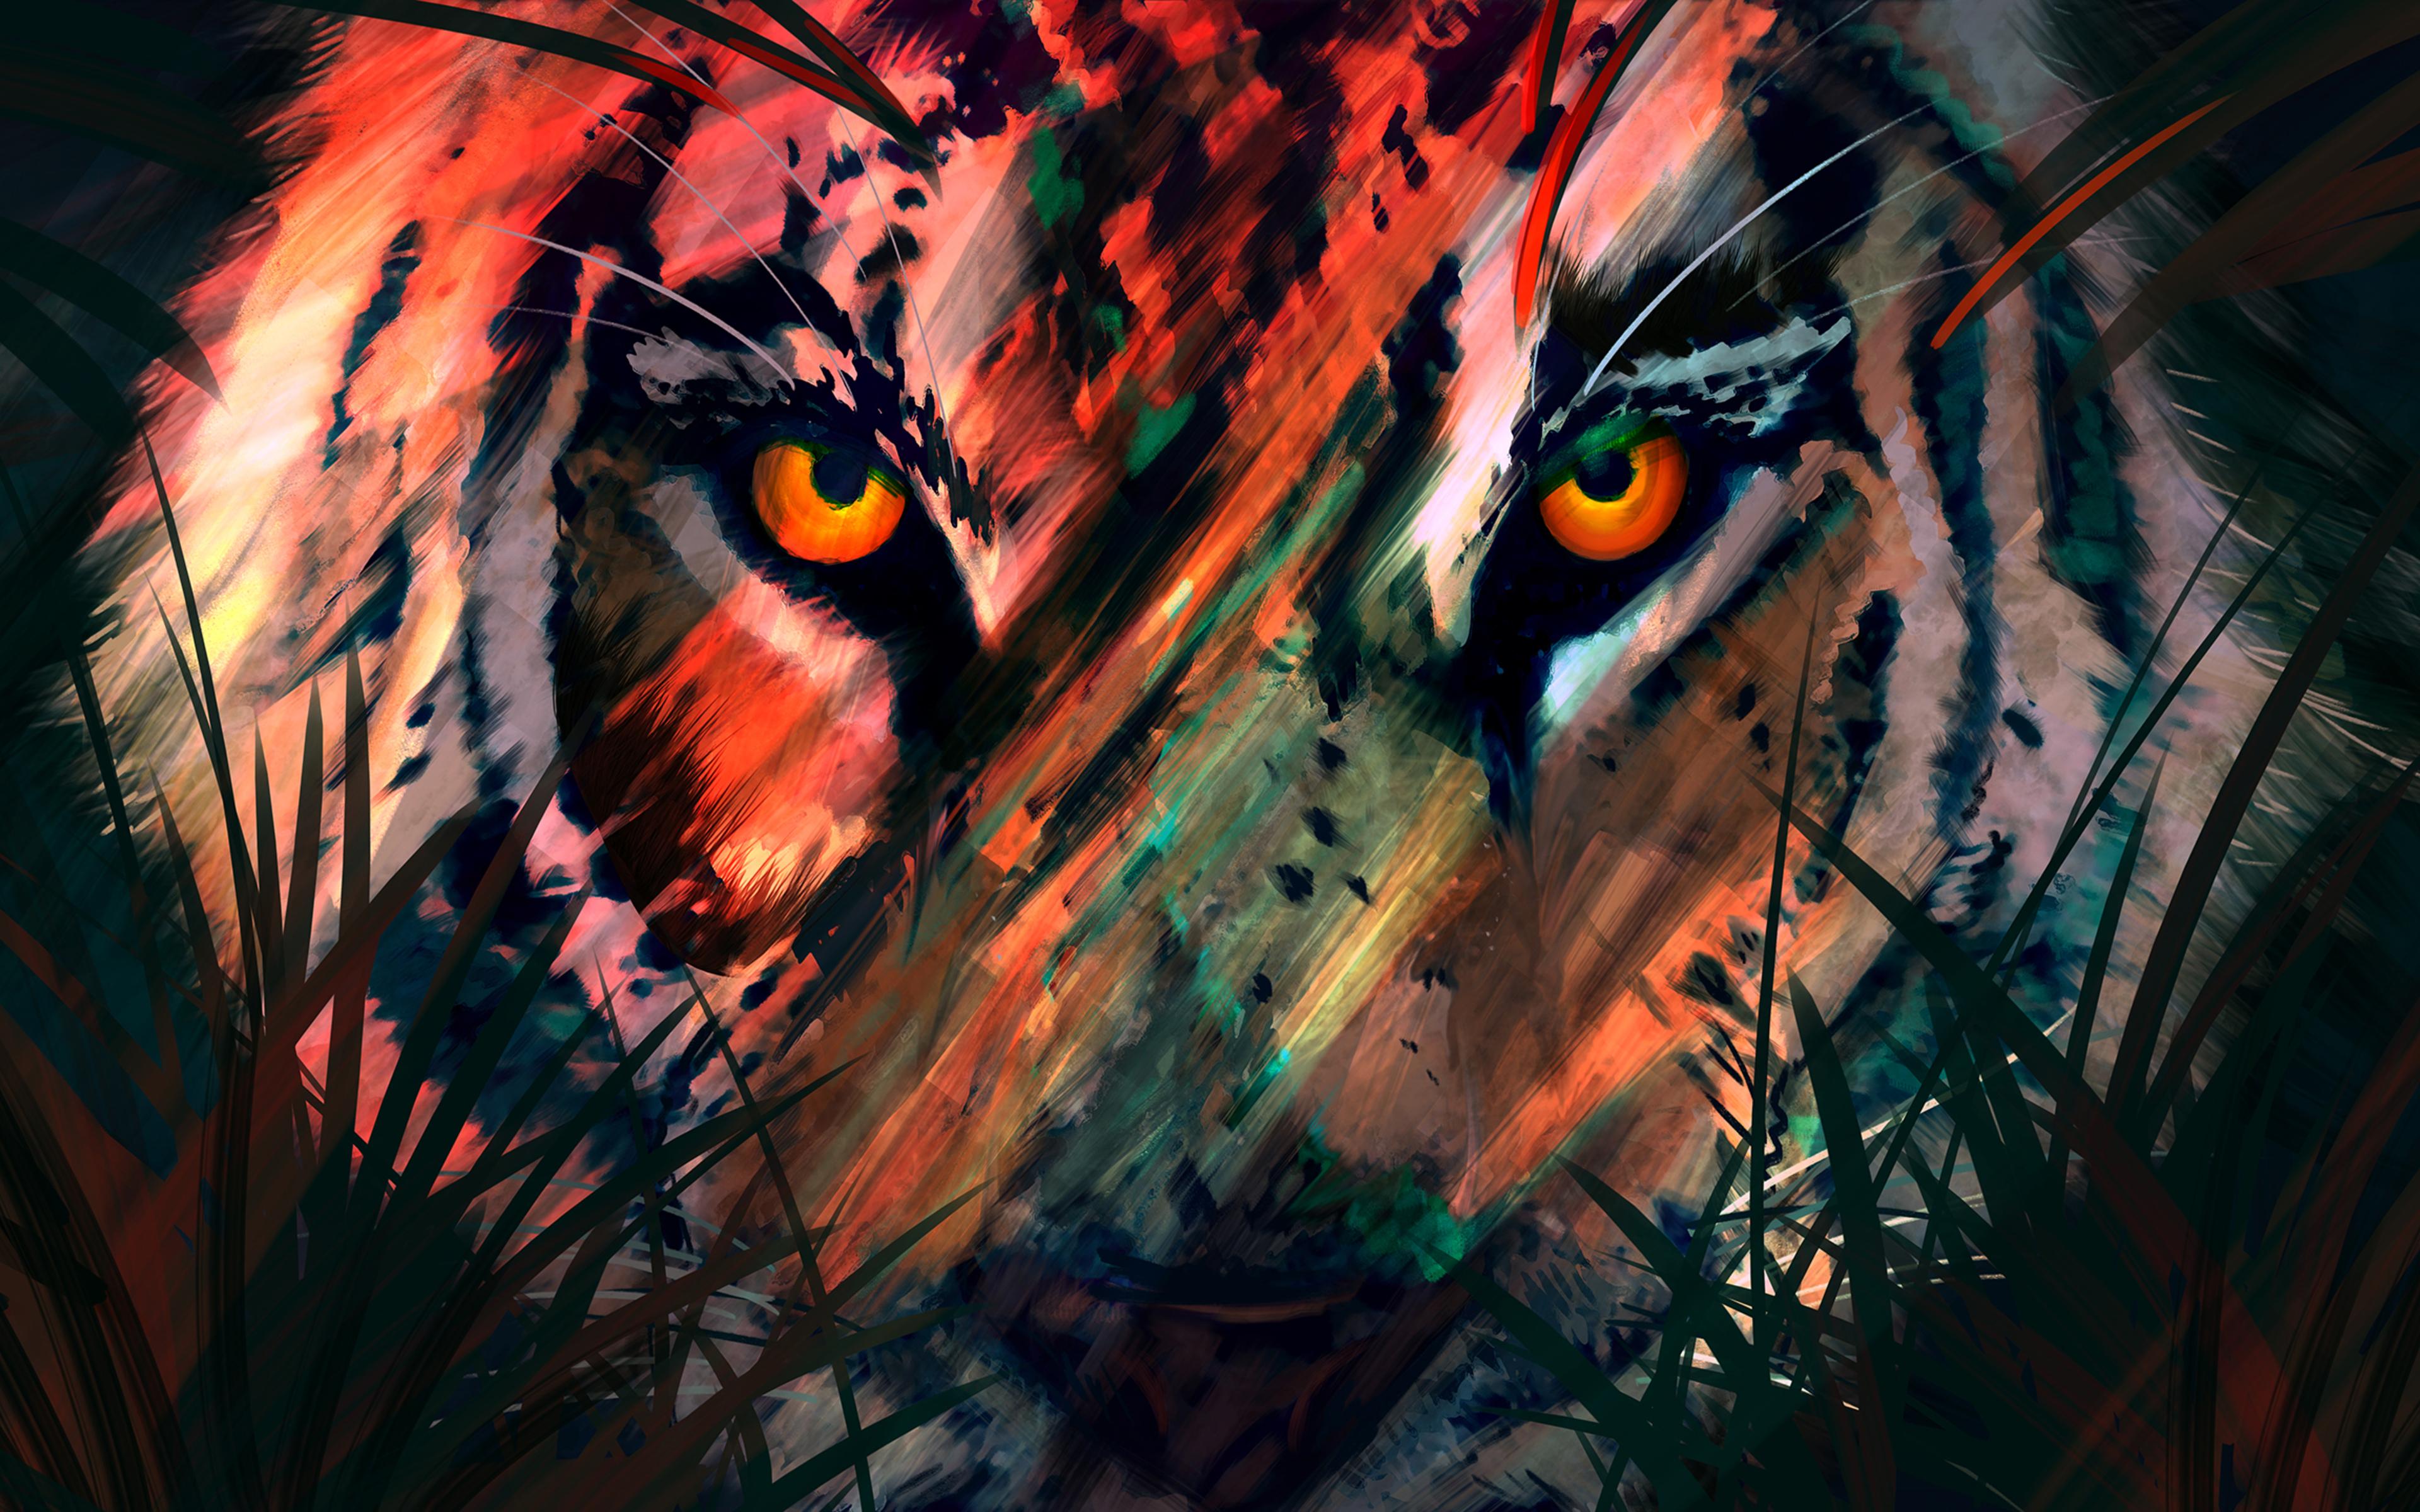 lion-dark-soul-abstract-2t.jpg